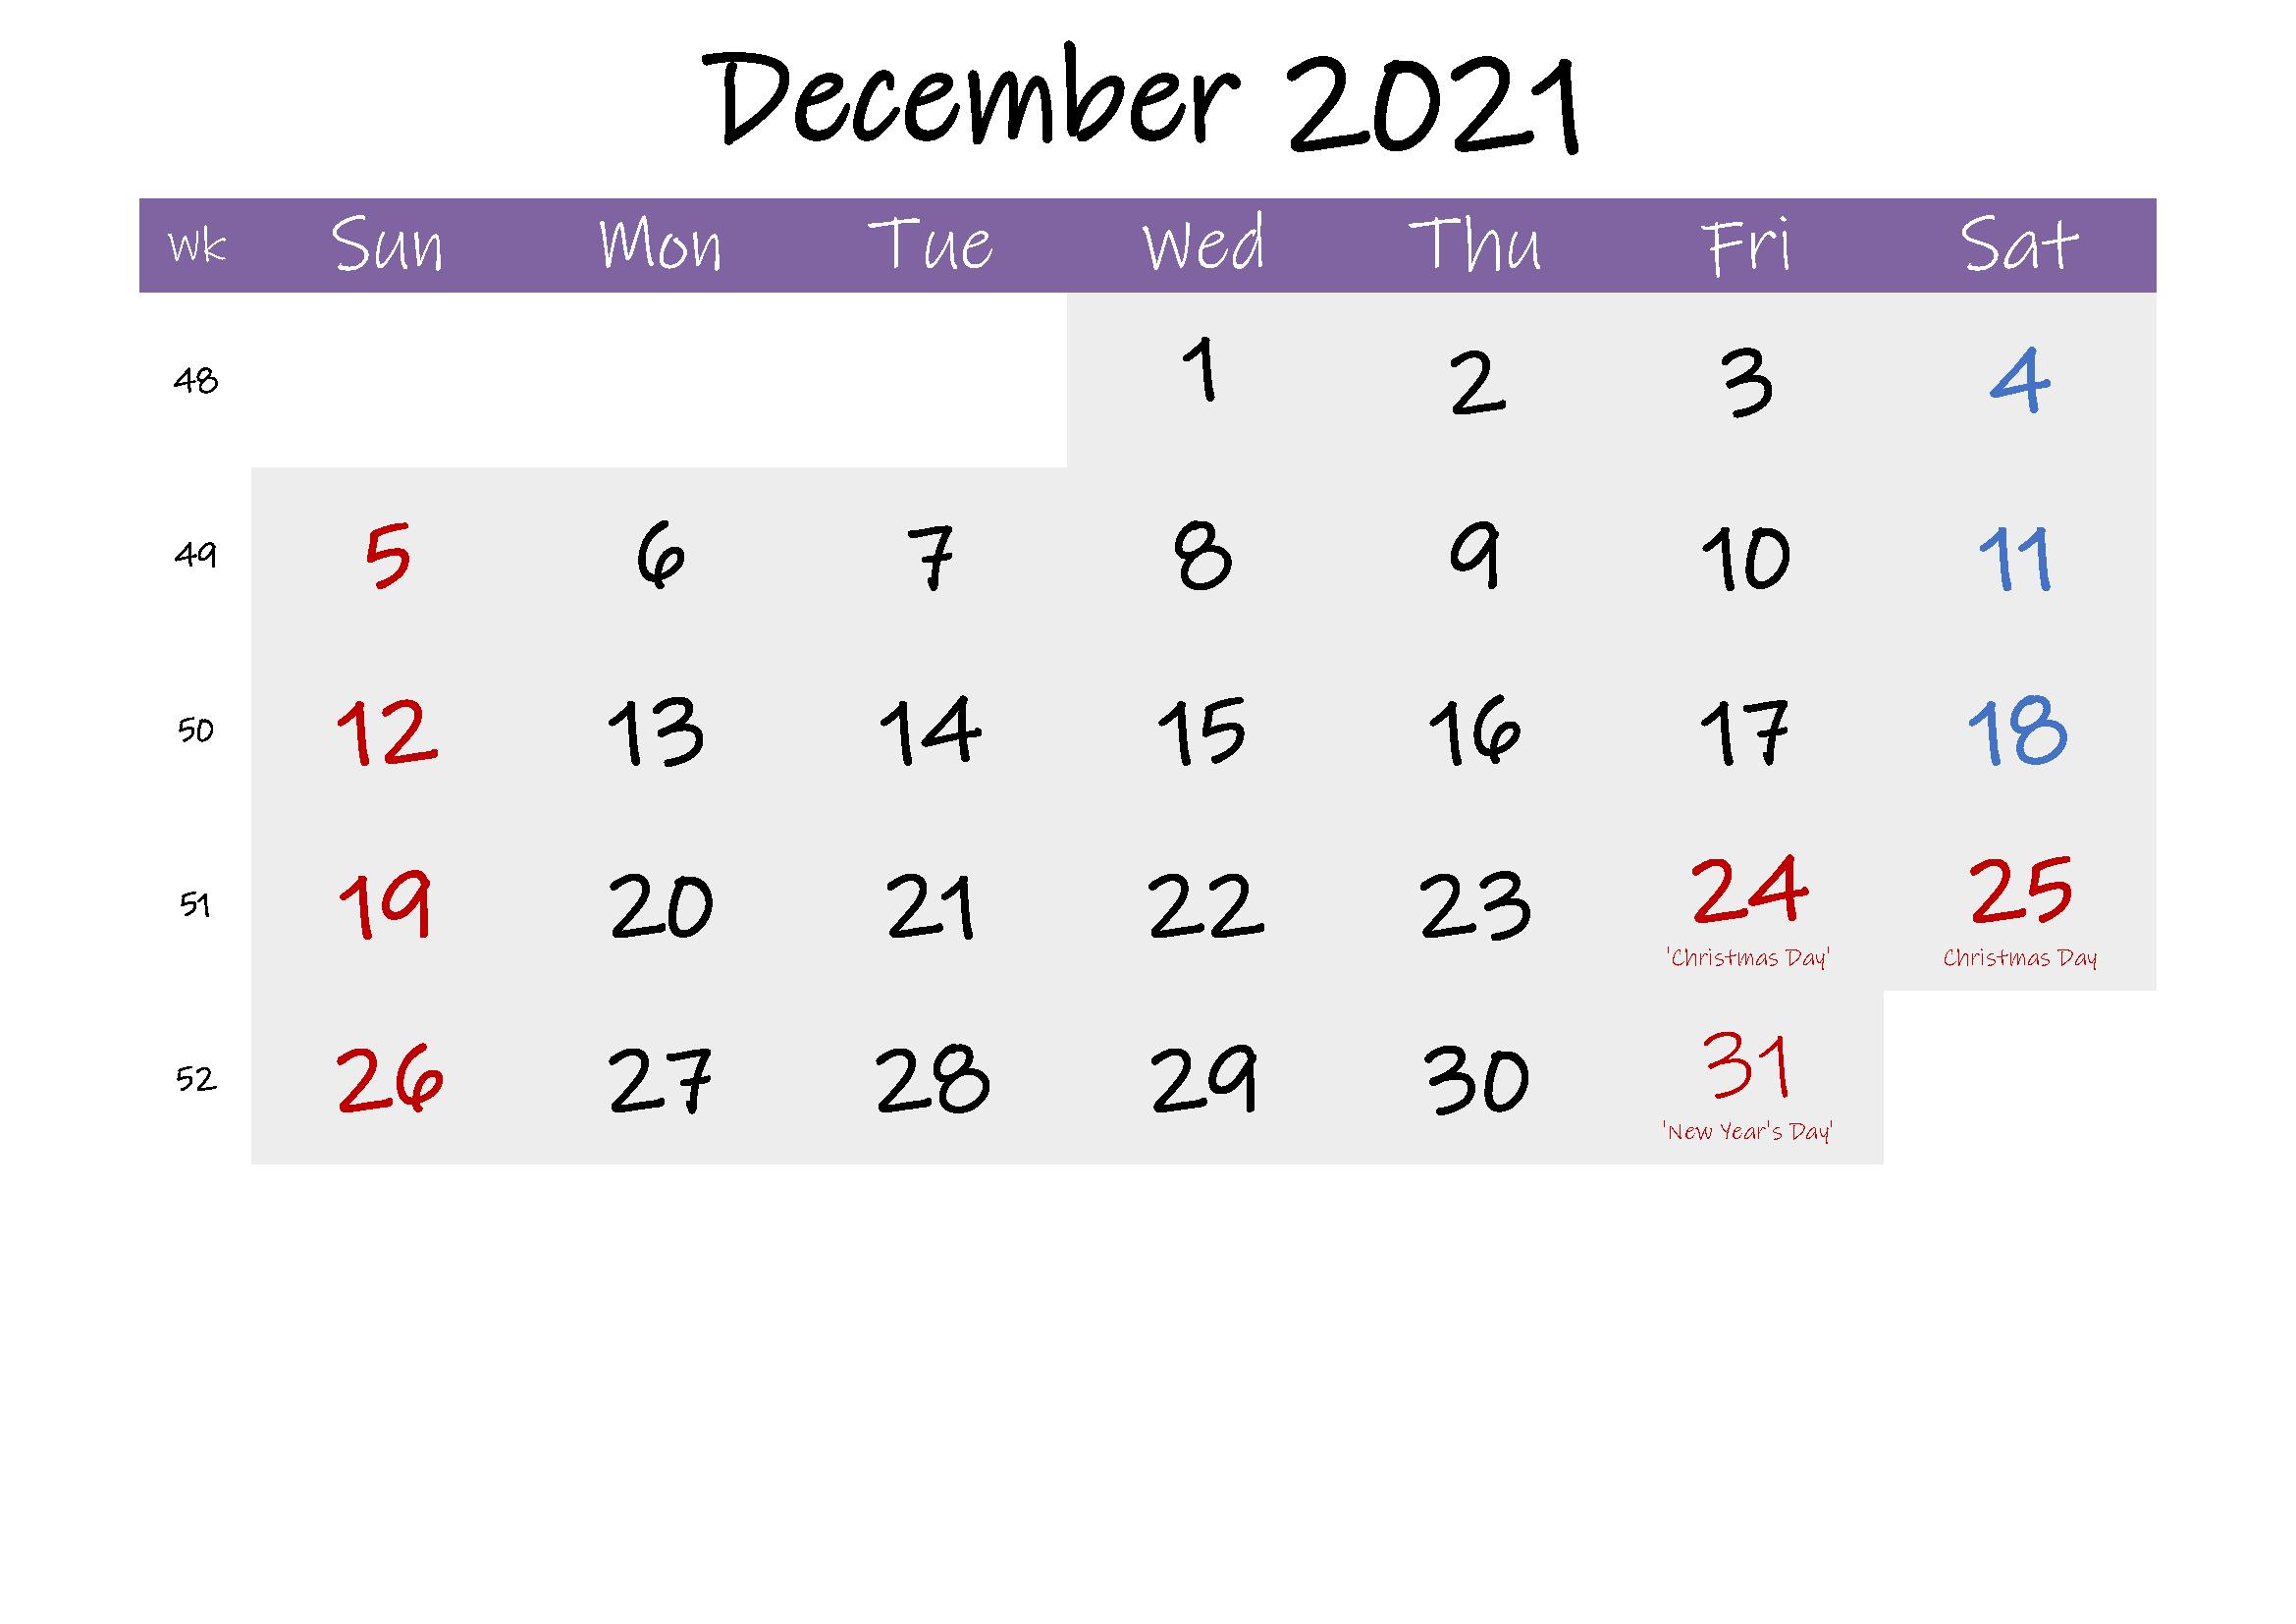 December 2021 Printable Calendar in Spanish